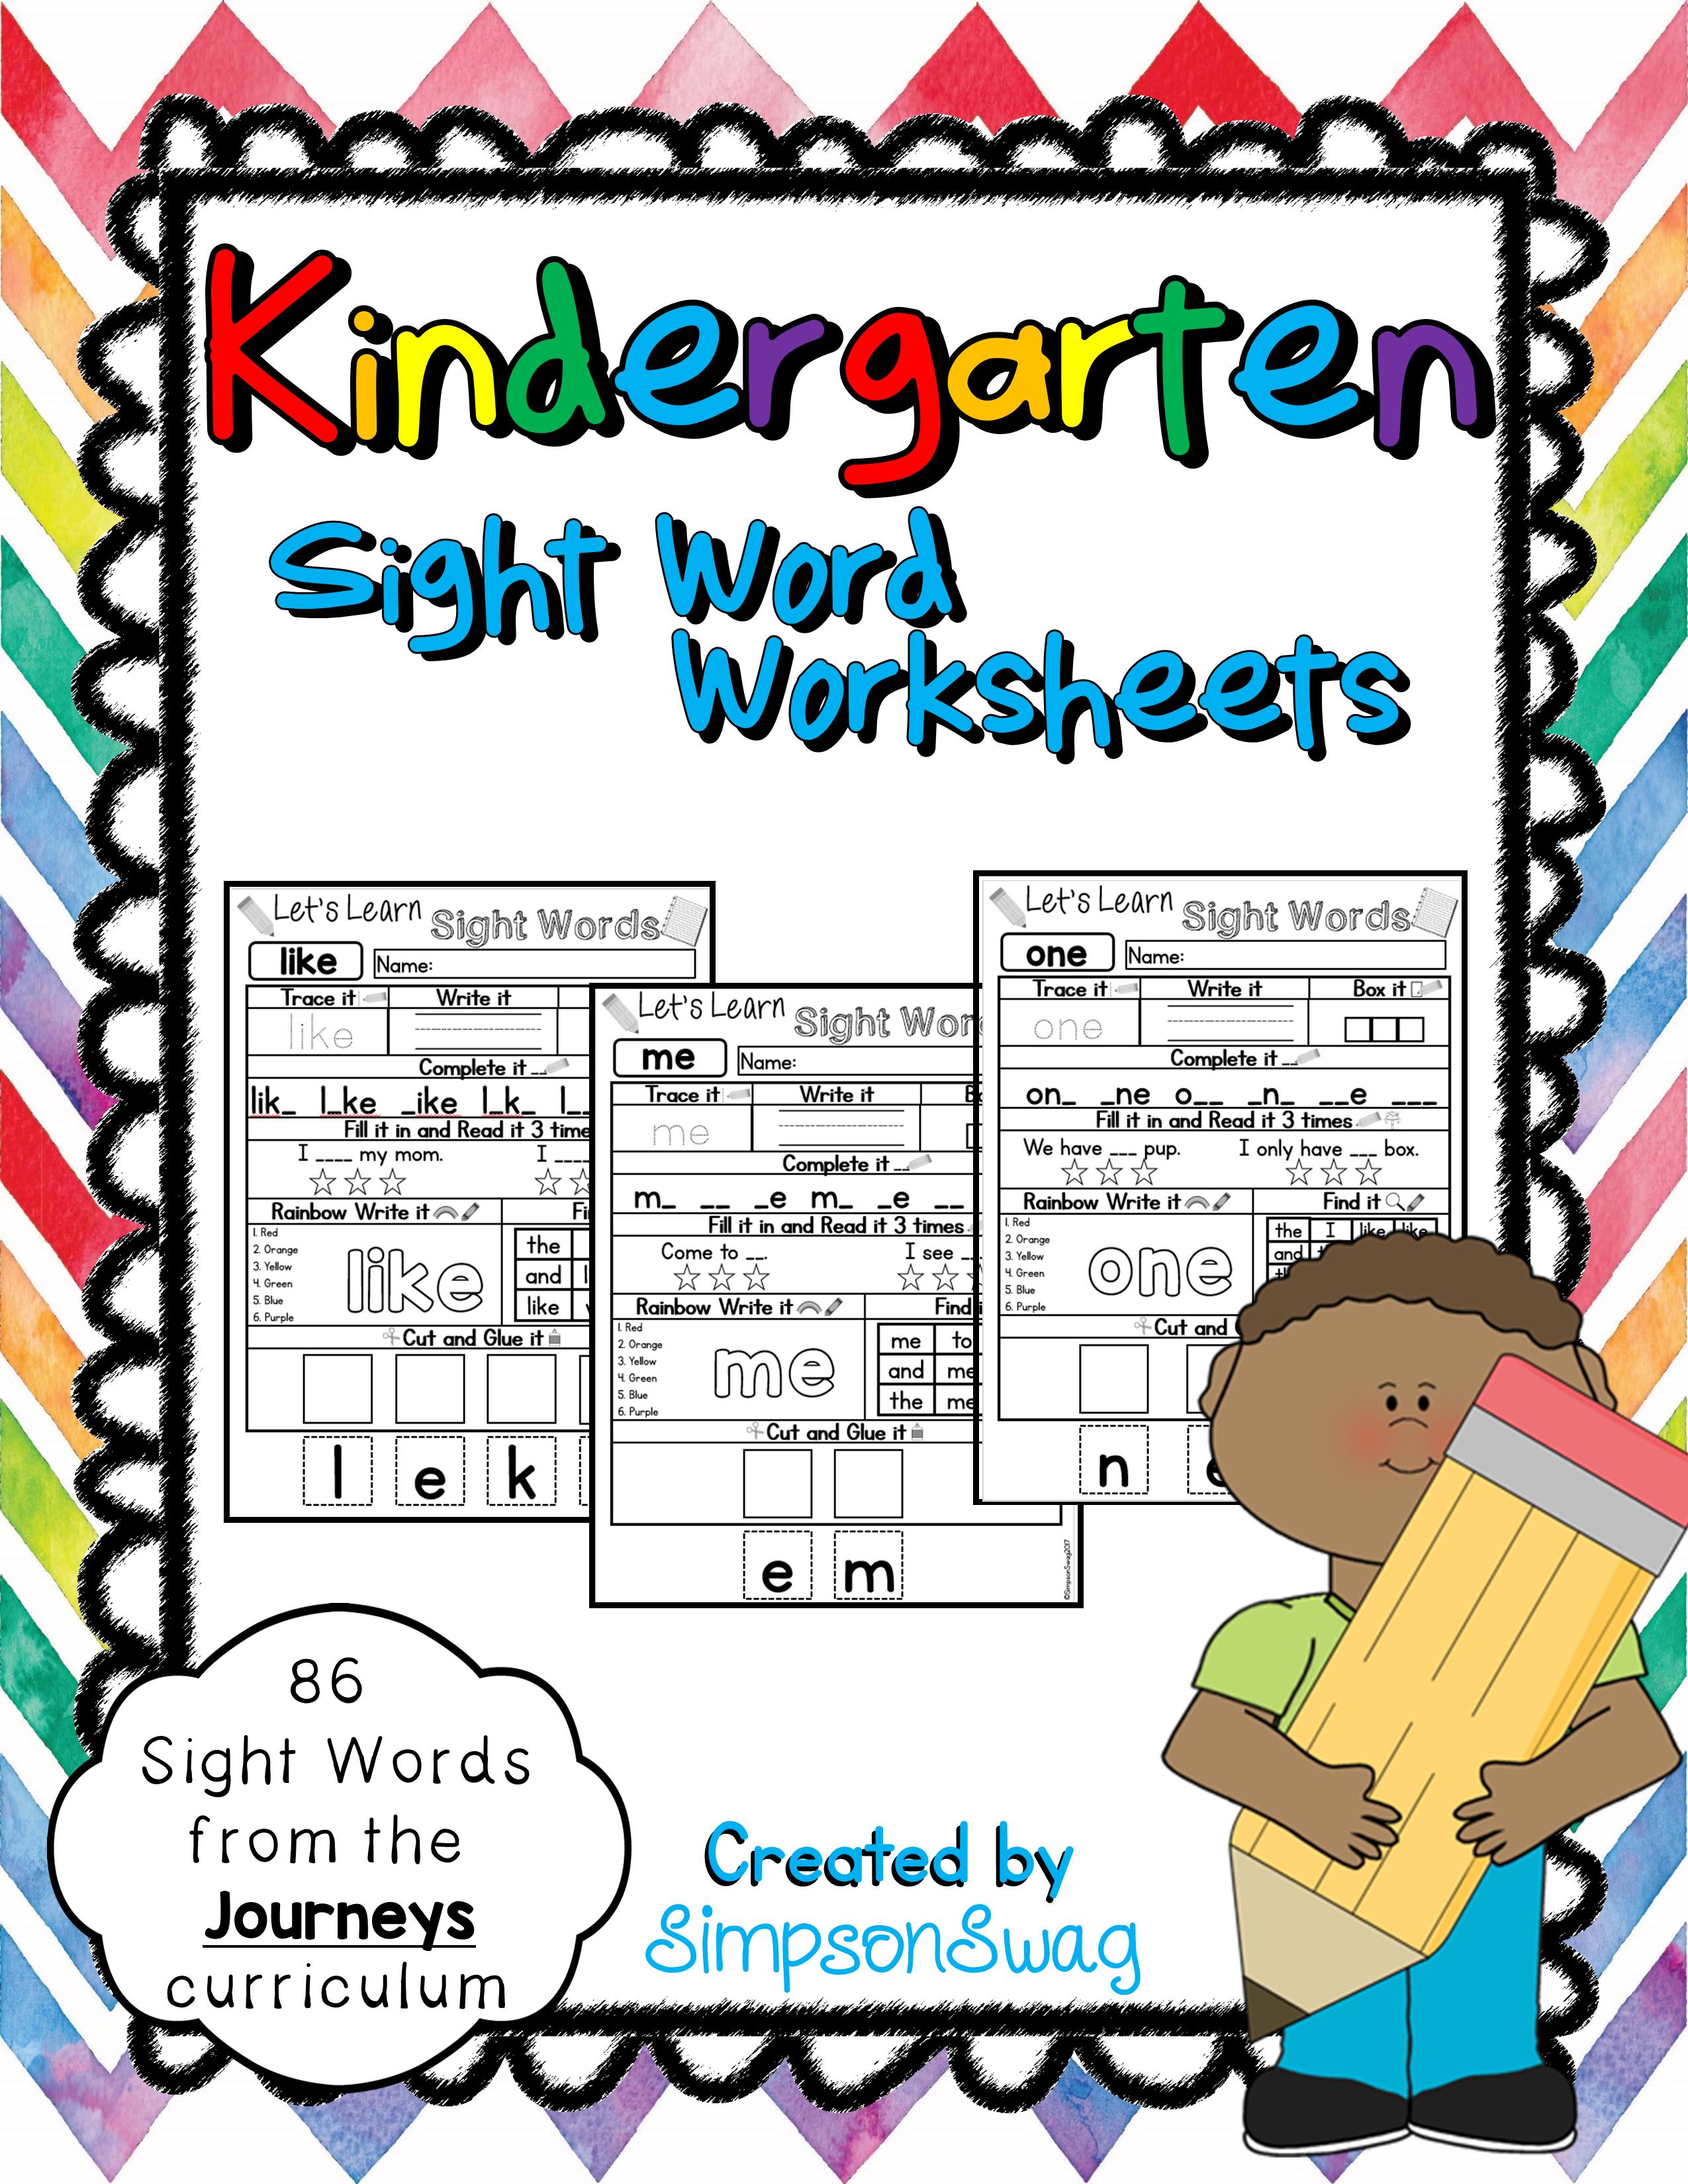 Journeys Sight Word Worksheets